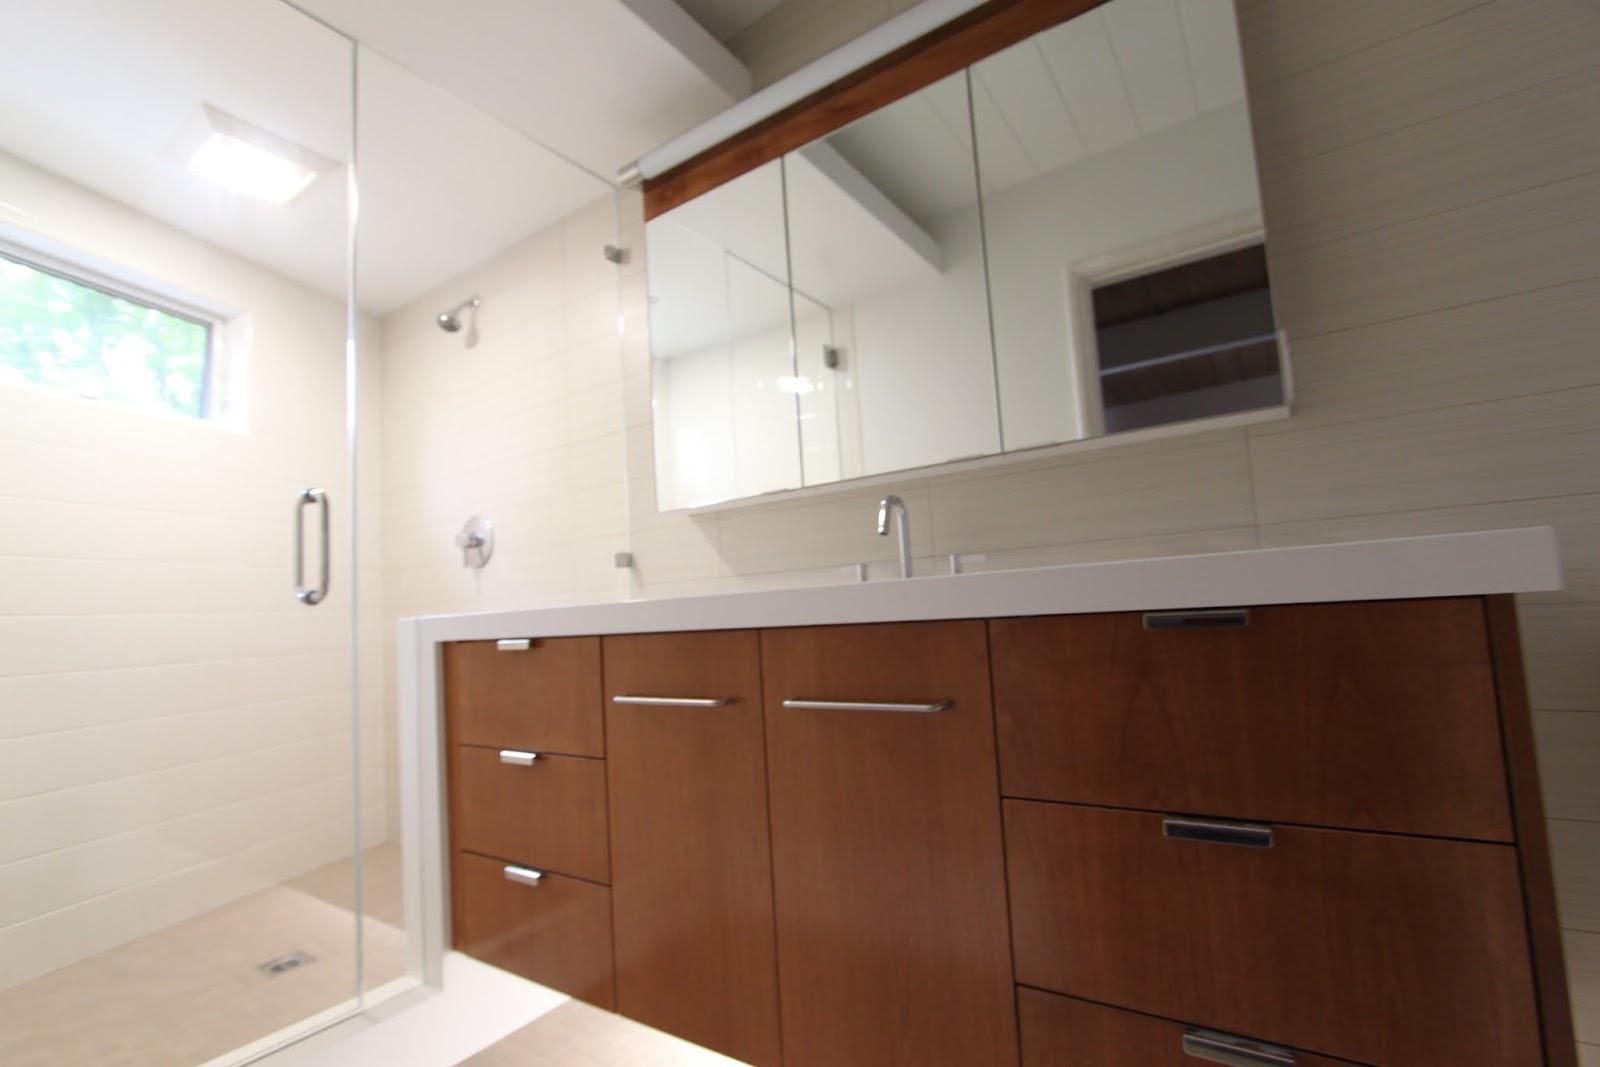 shower doors and paint in mid-century modern bathroom ...